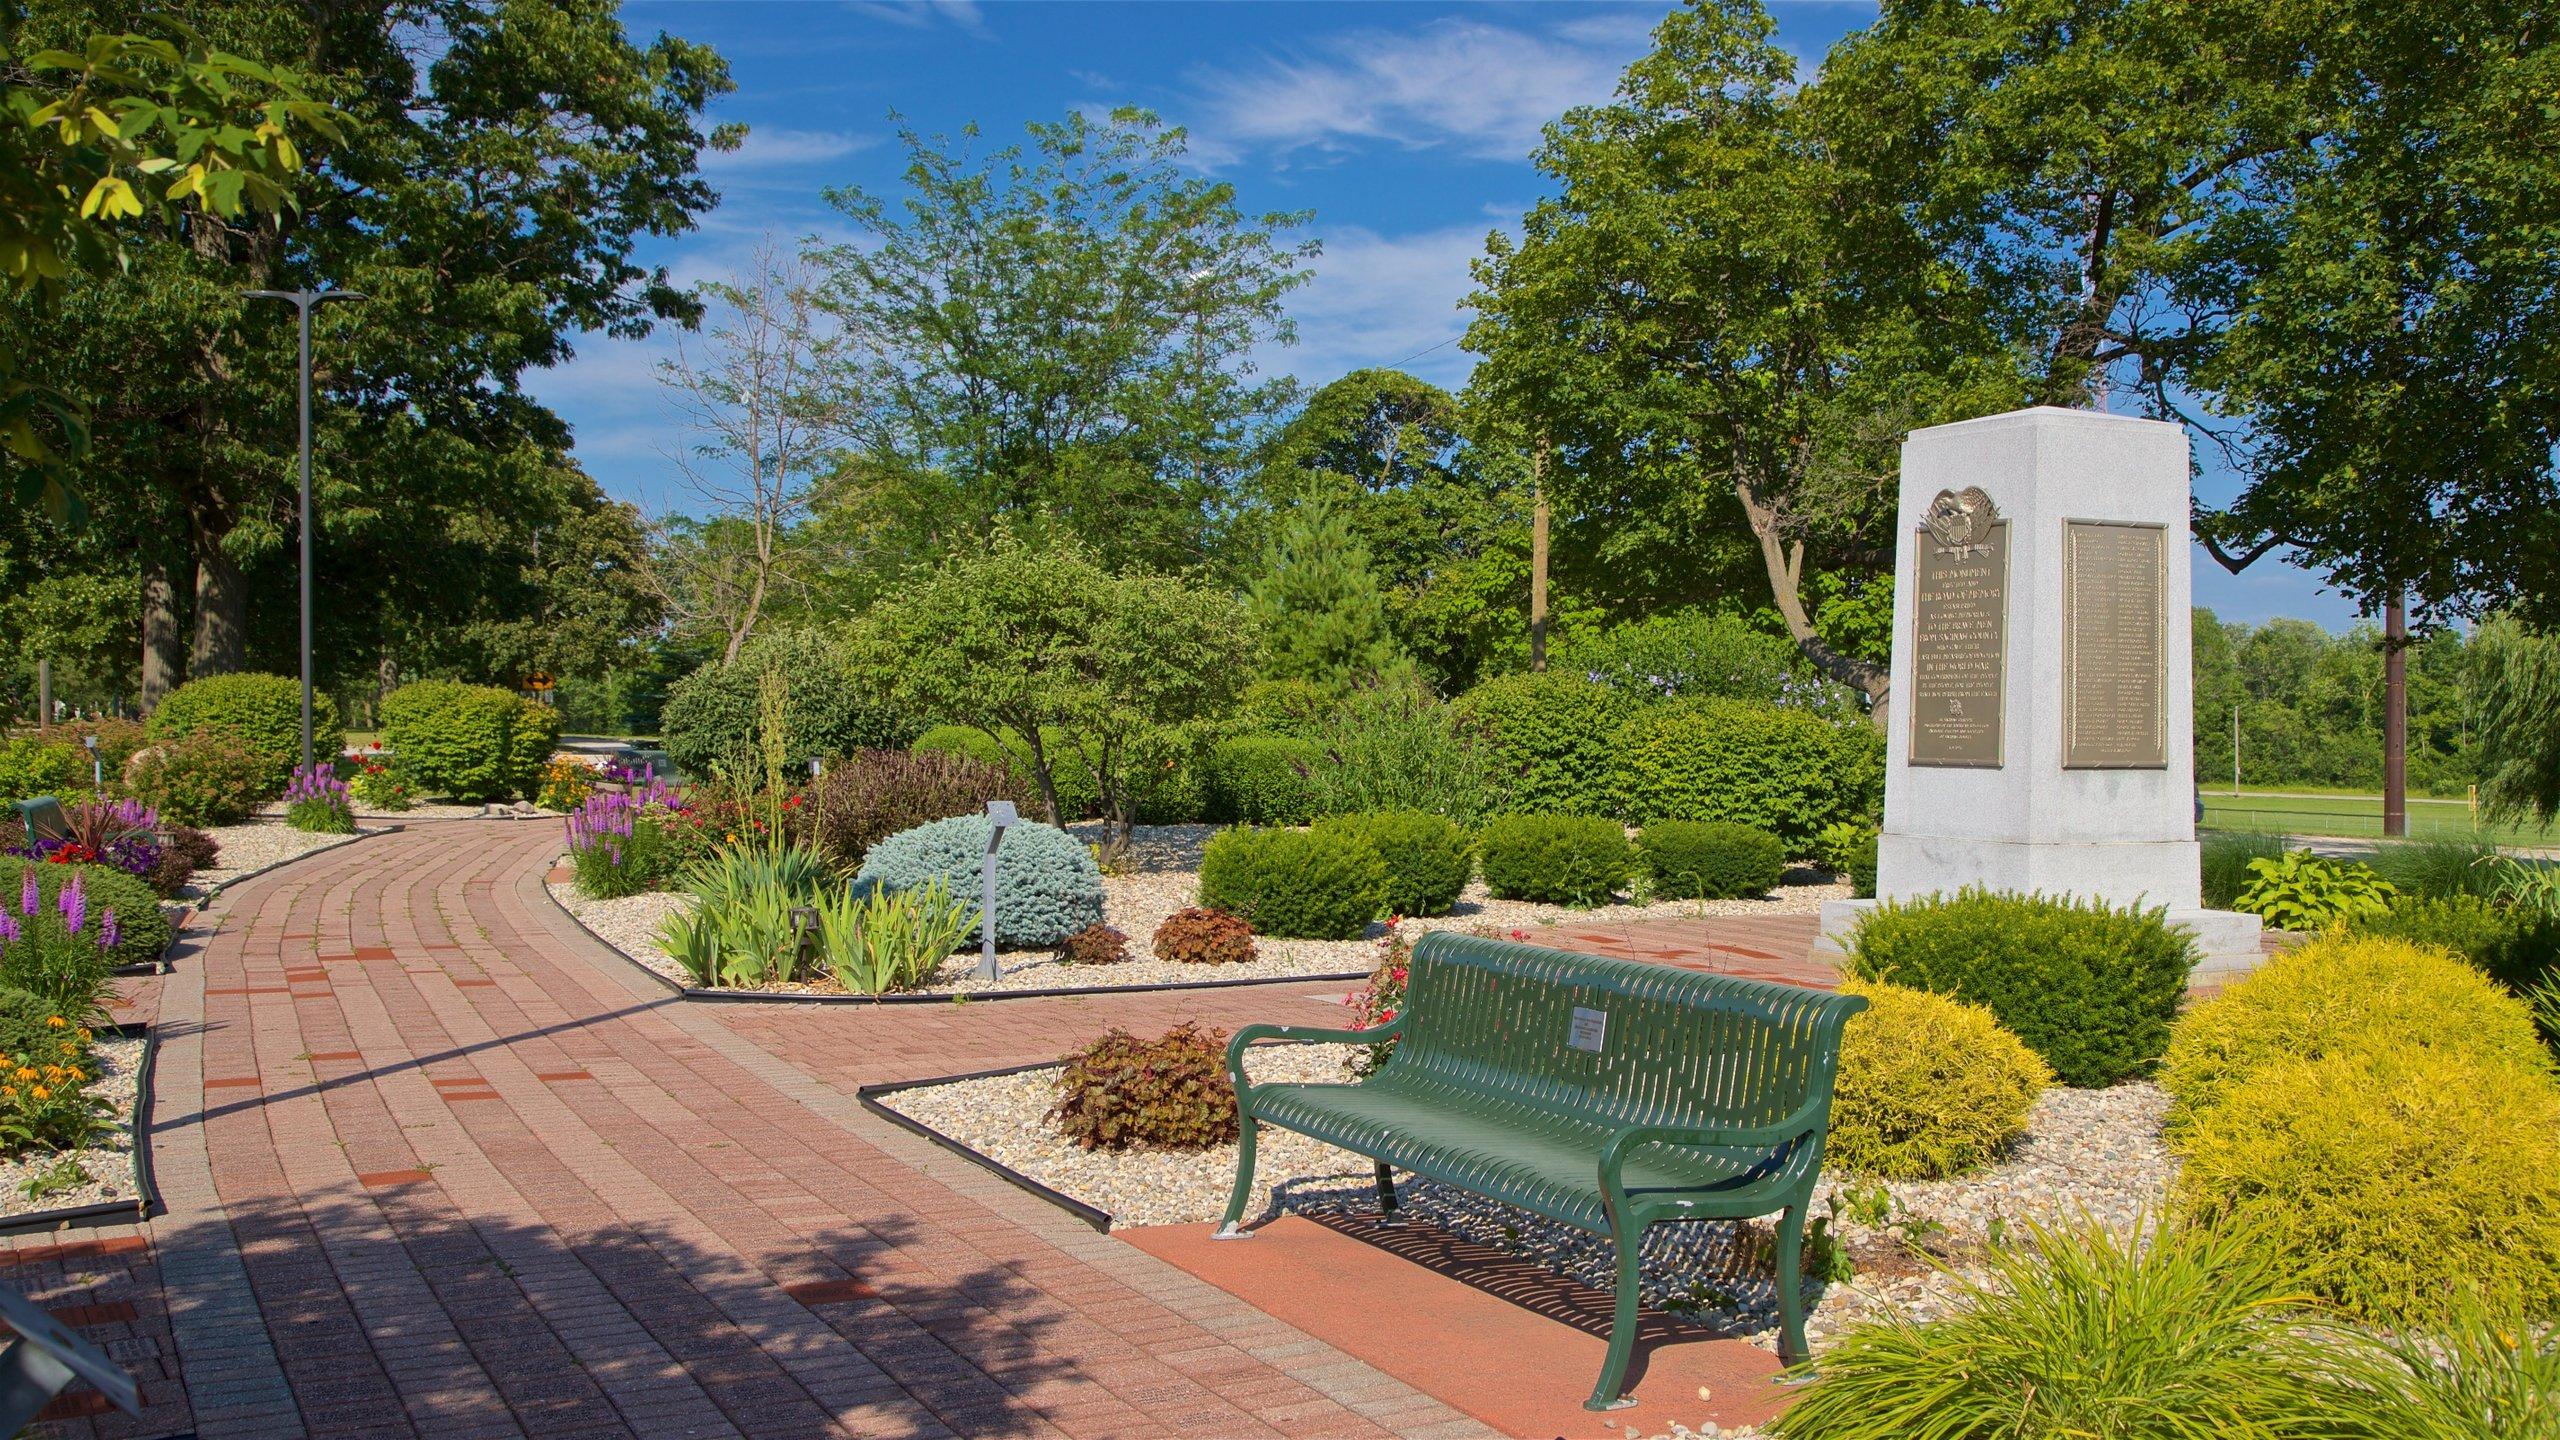 Hoyt Park, Saginaw, Michigan, United States of America